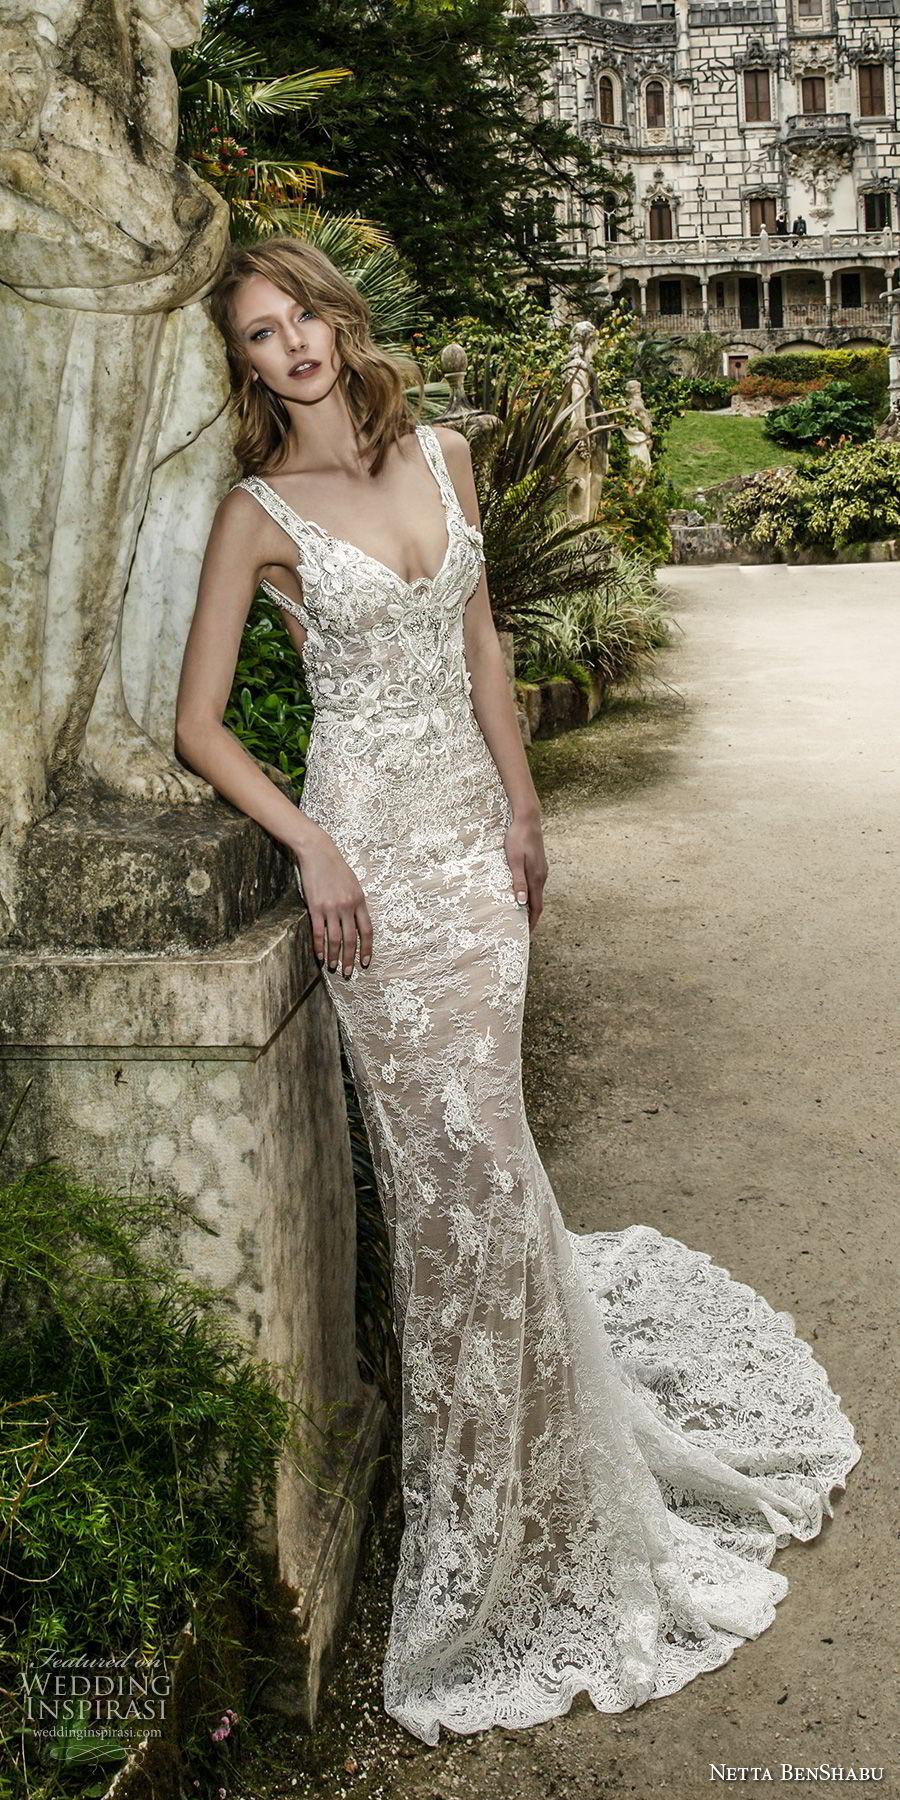 netta benshabu 2017 bridal sleeveless sweetheart neckline with strap full embellishment elegant fit and flare wedding dress open back medium train (17) mv